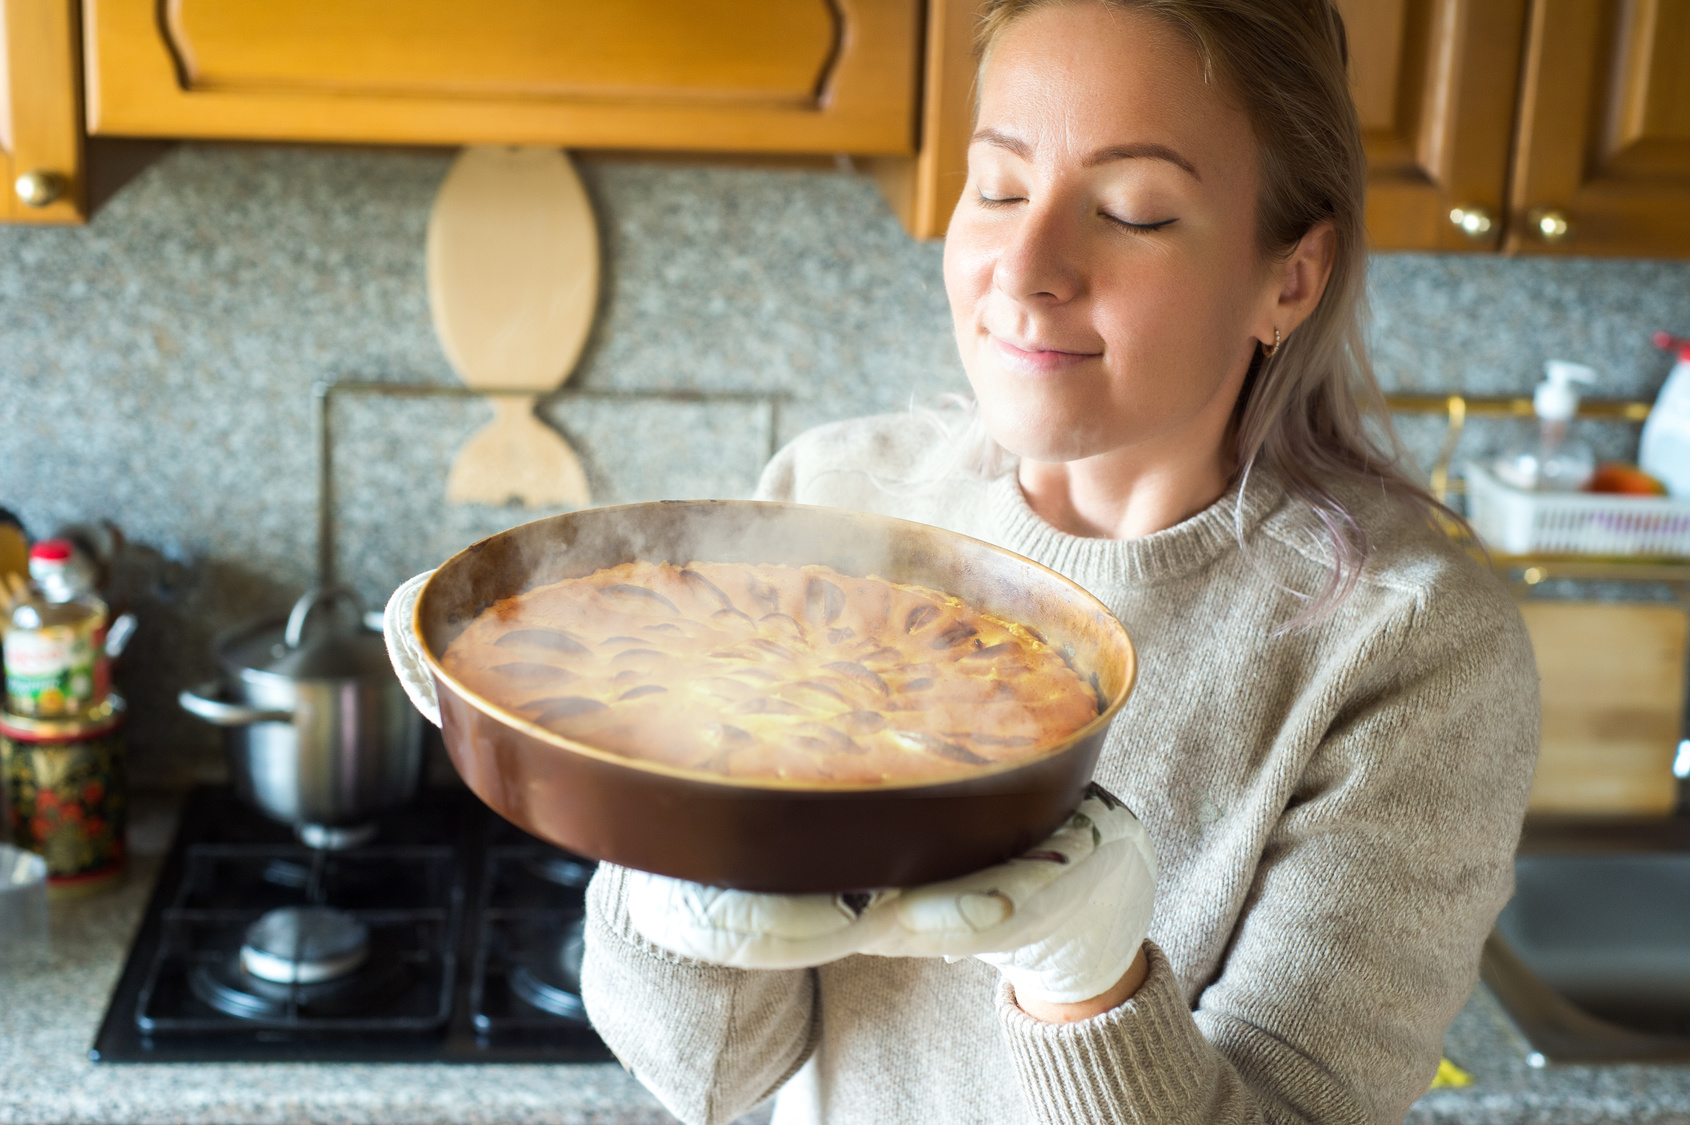 cucinare torta cucina profumo odore aromi dolci